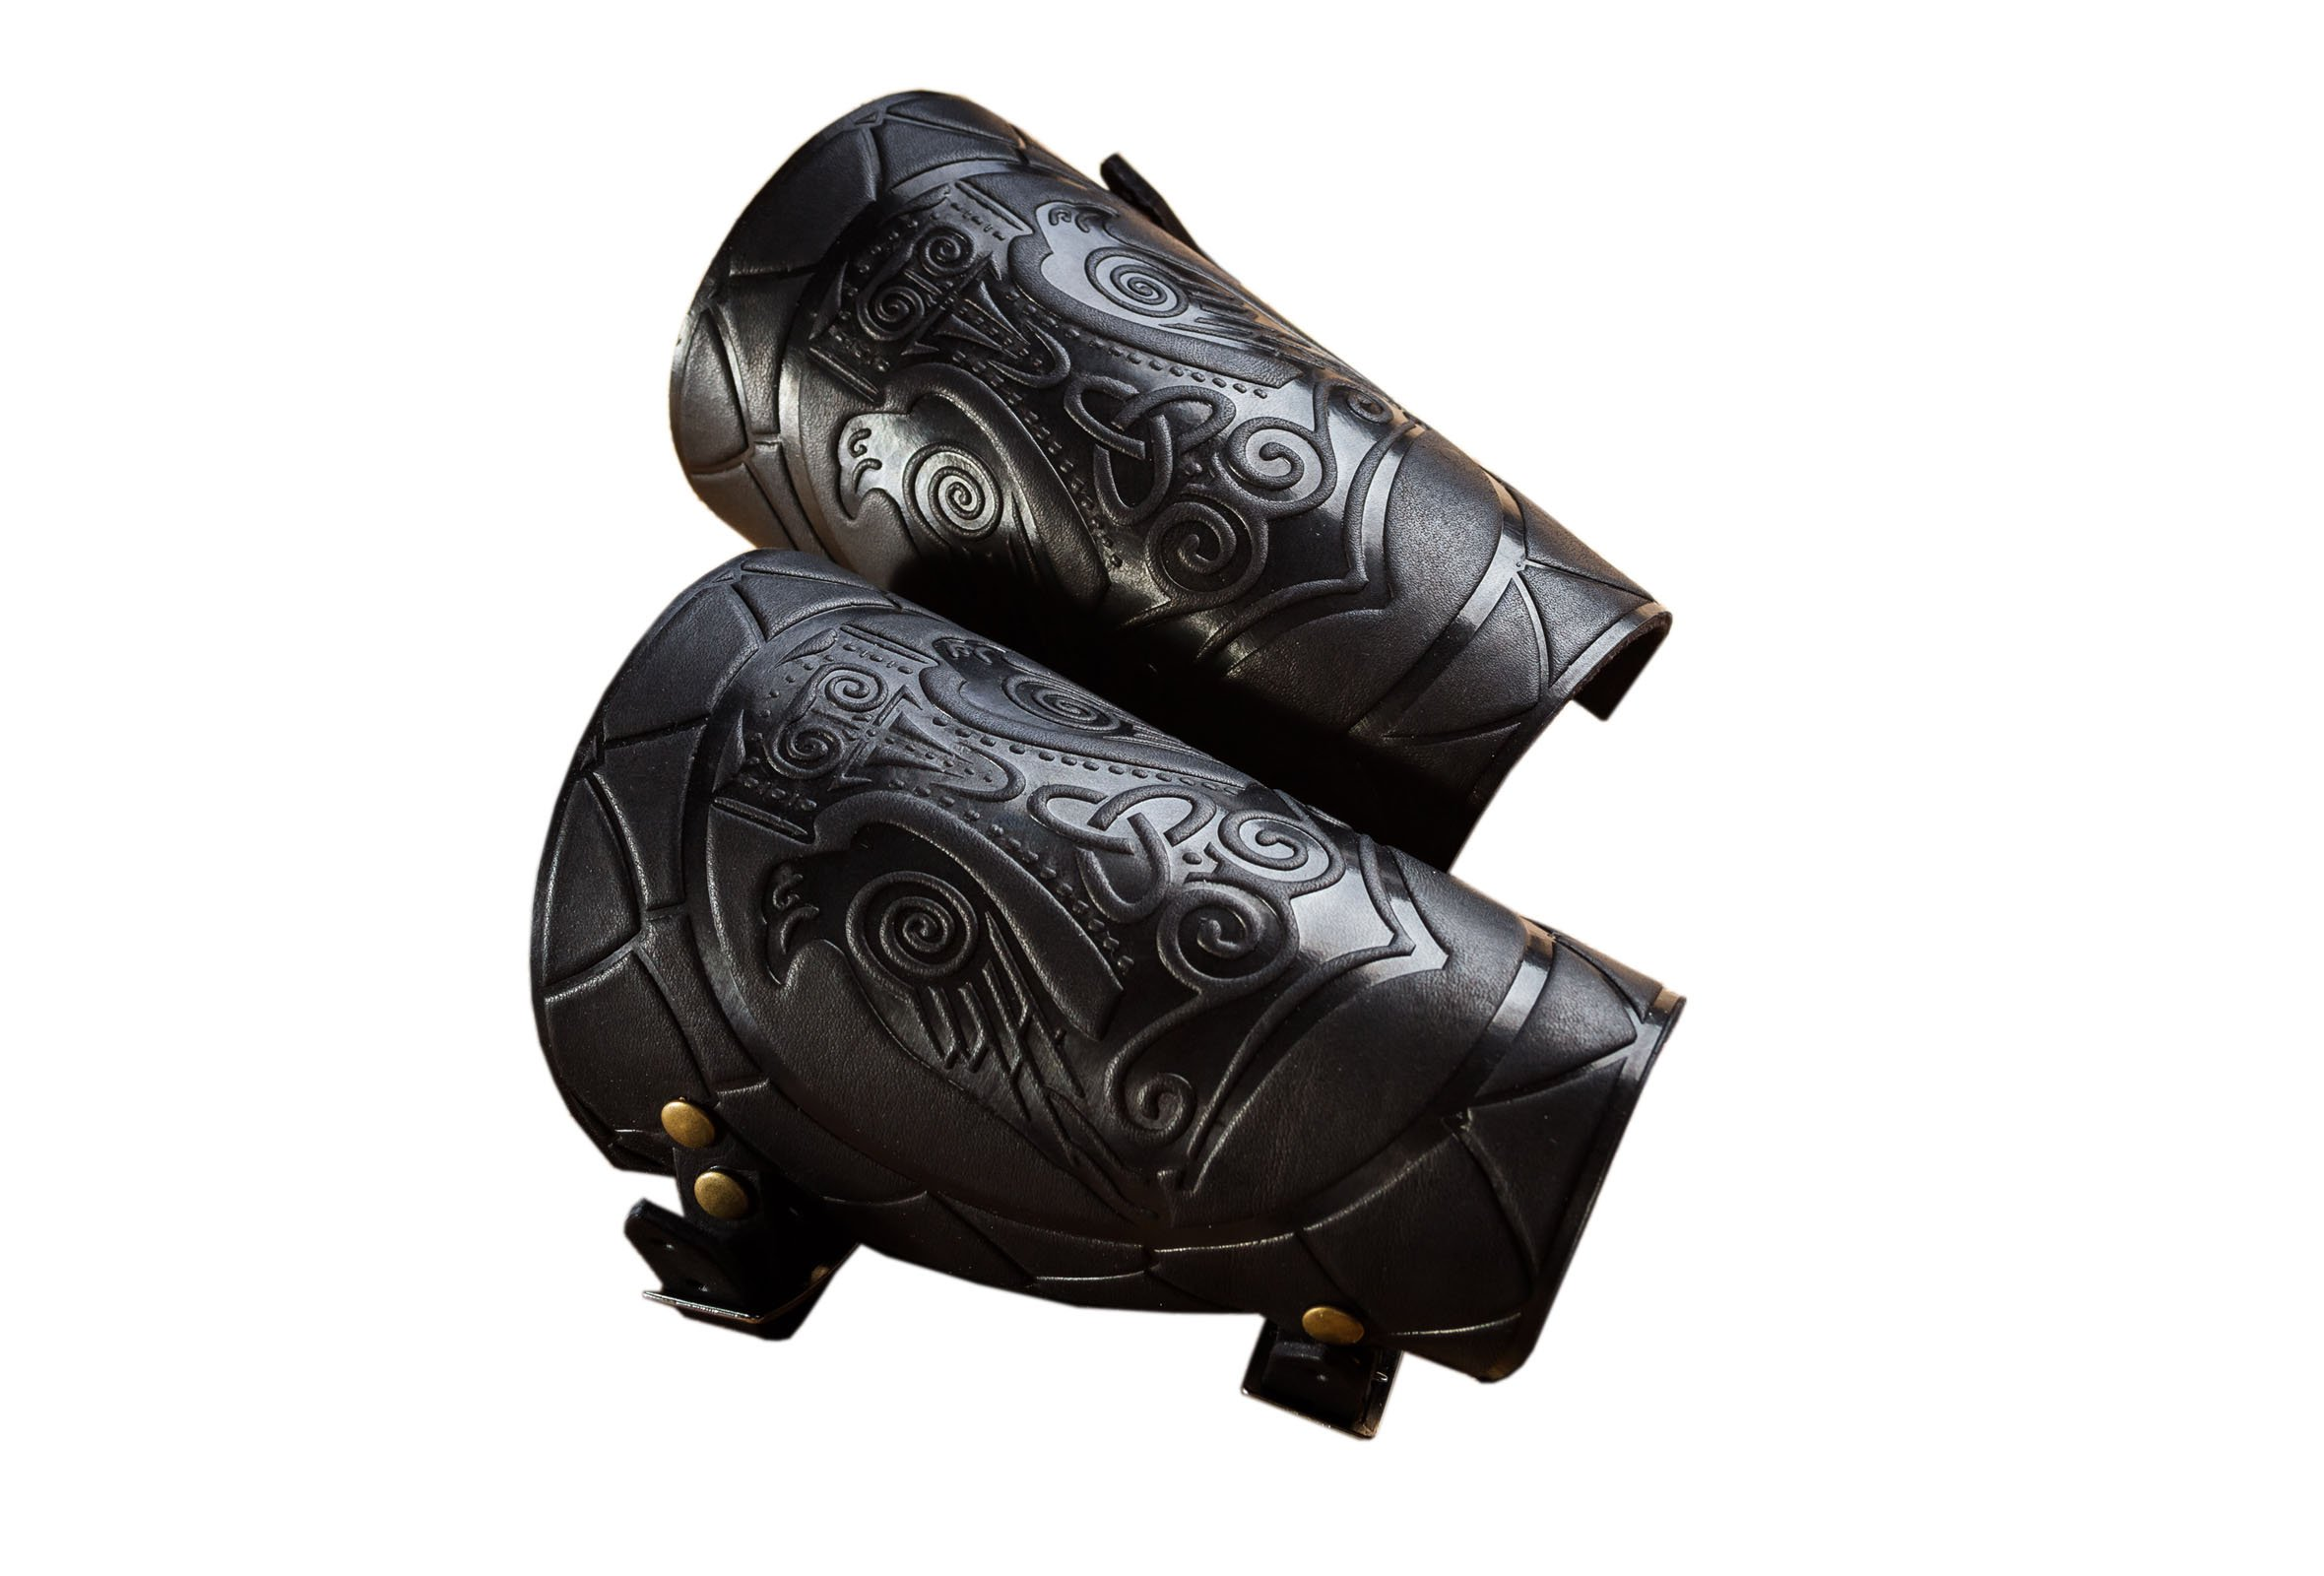 Stahlgilde Genui Leather Cuff LARP Bracers Armor Thor's Hammer Mjolnir Vikings a Pair